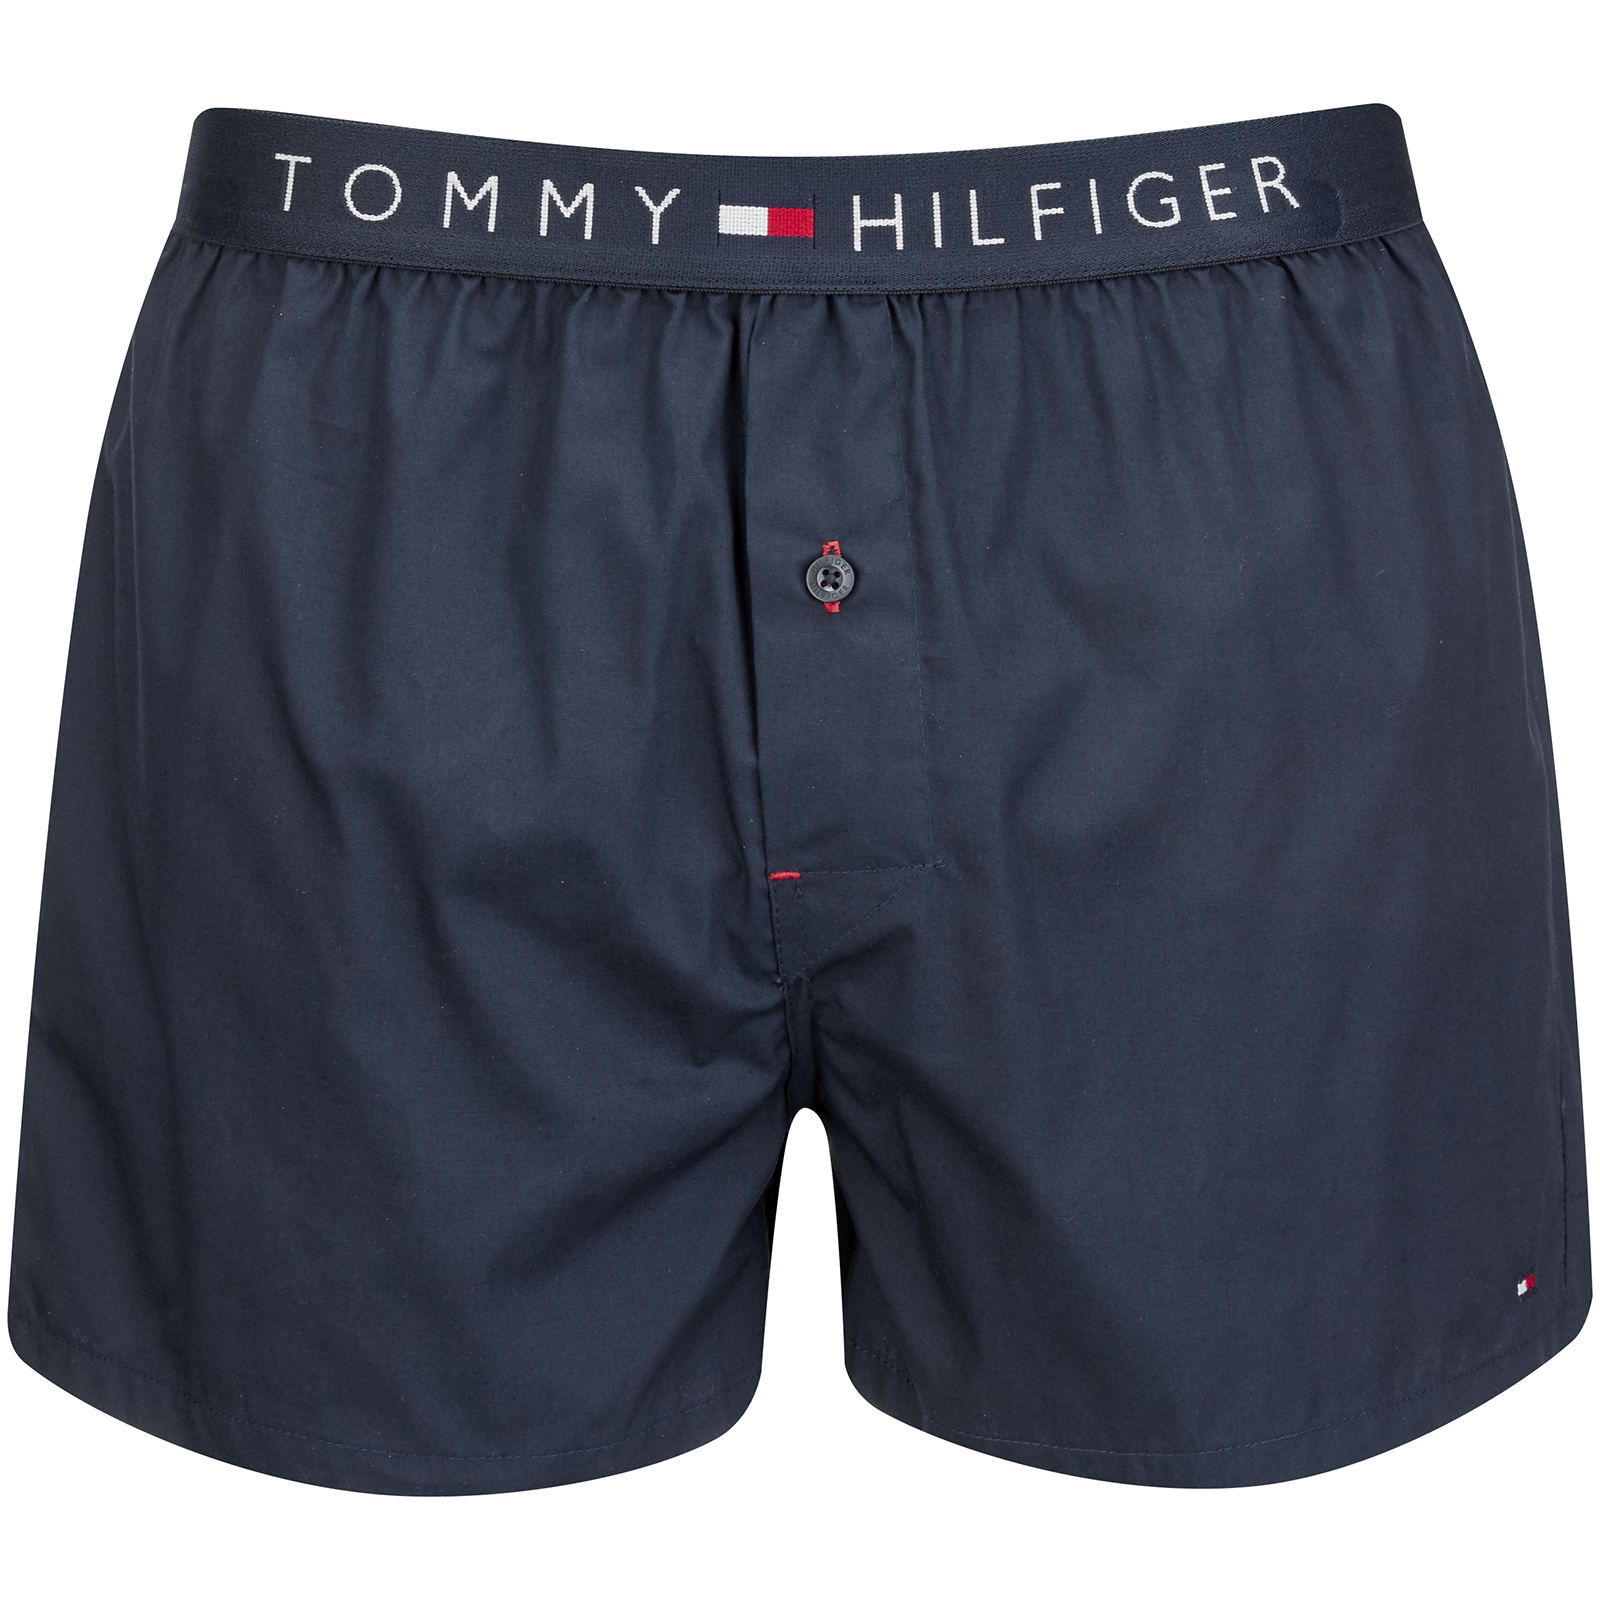 47694ff95f5e Tommy Hilfiger Men's Icon Cotton Woven Boxer Shorts - Navy Blazer Mens  Underwear | TheHut.com